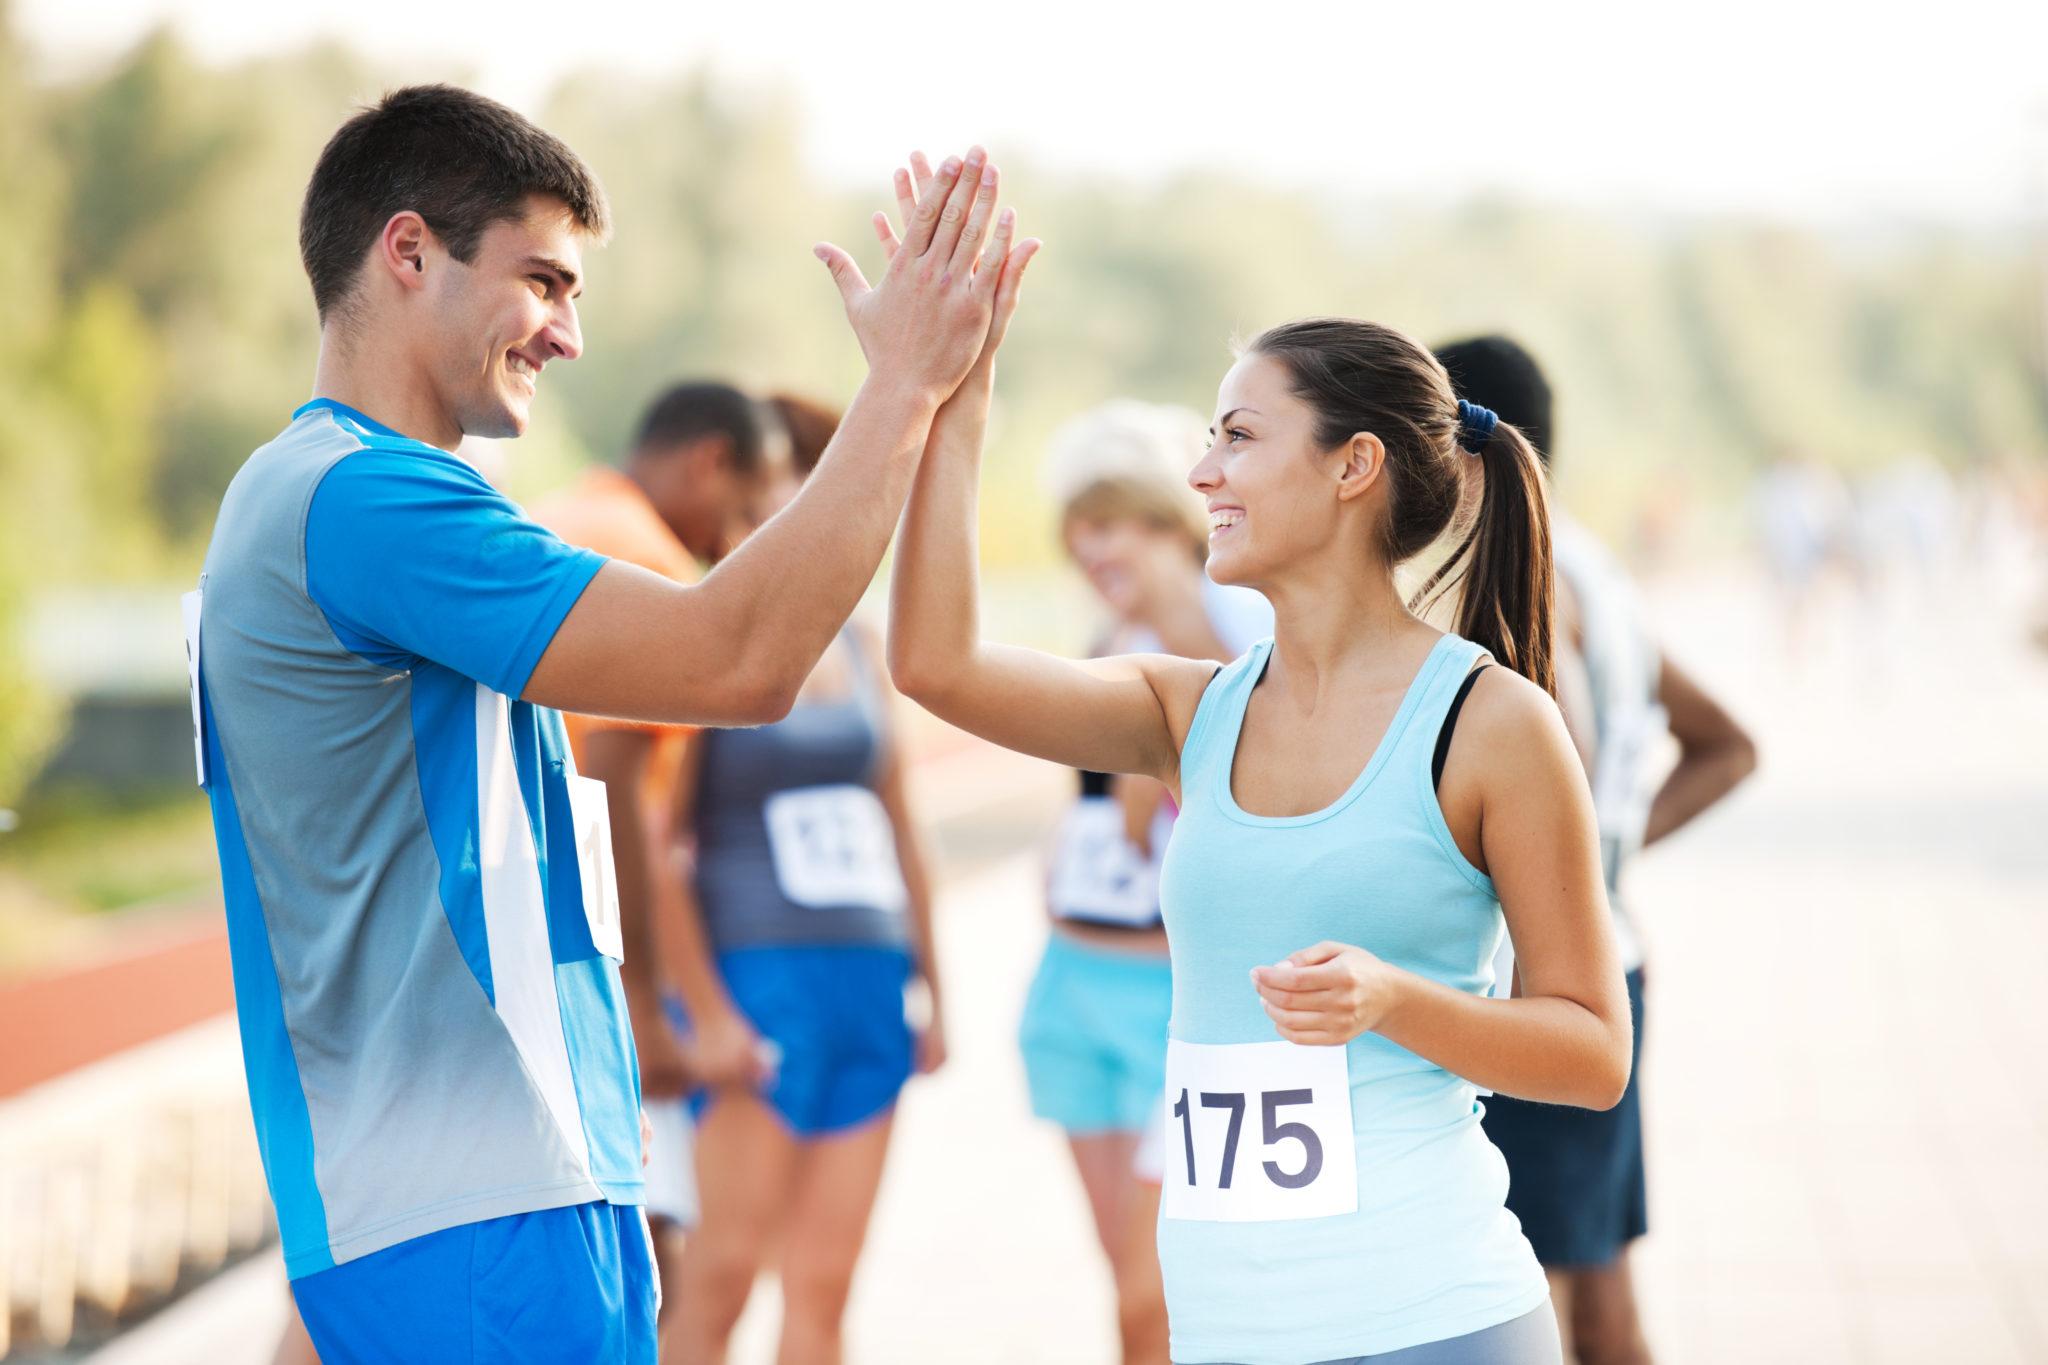 Marathon runners giving high five.